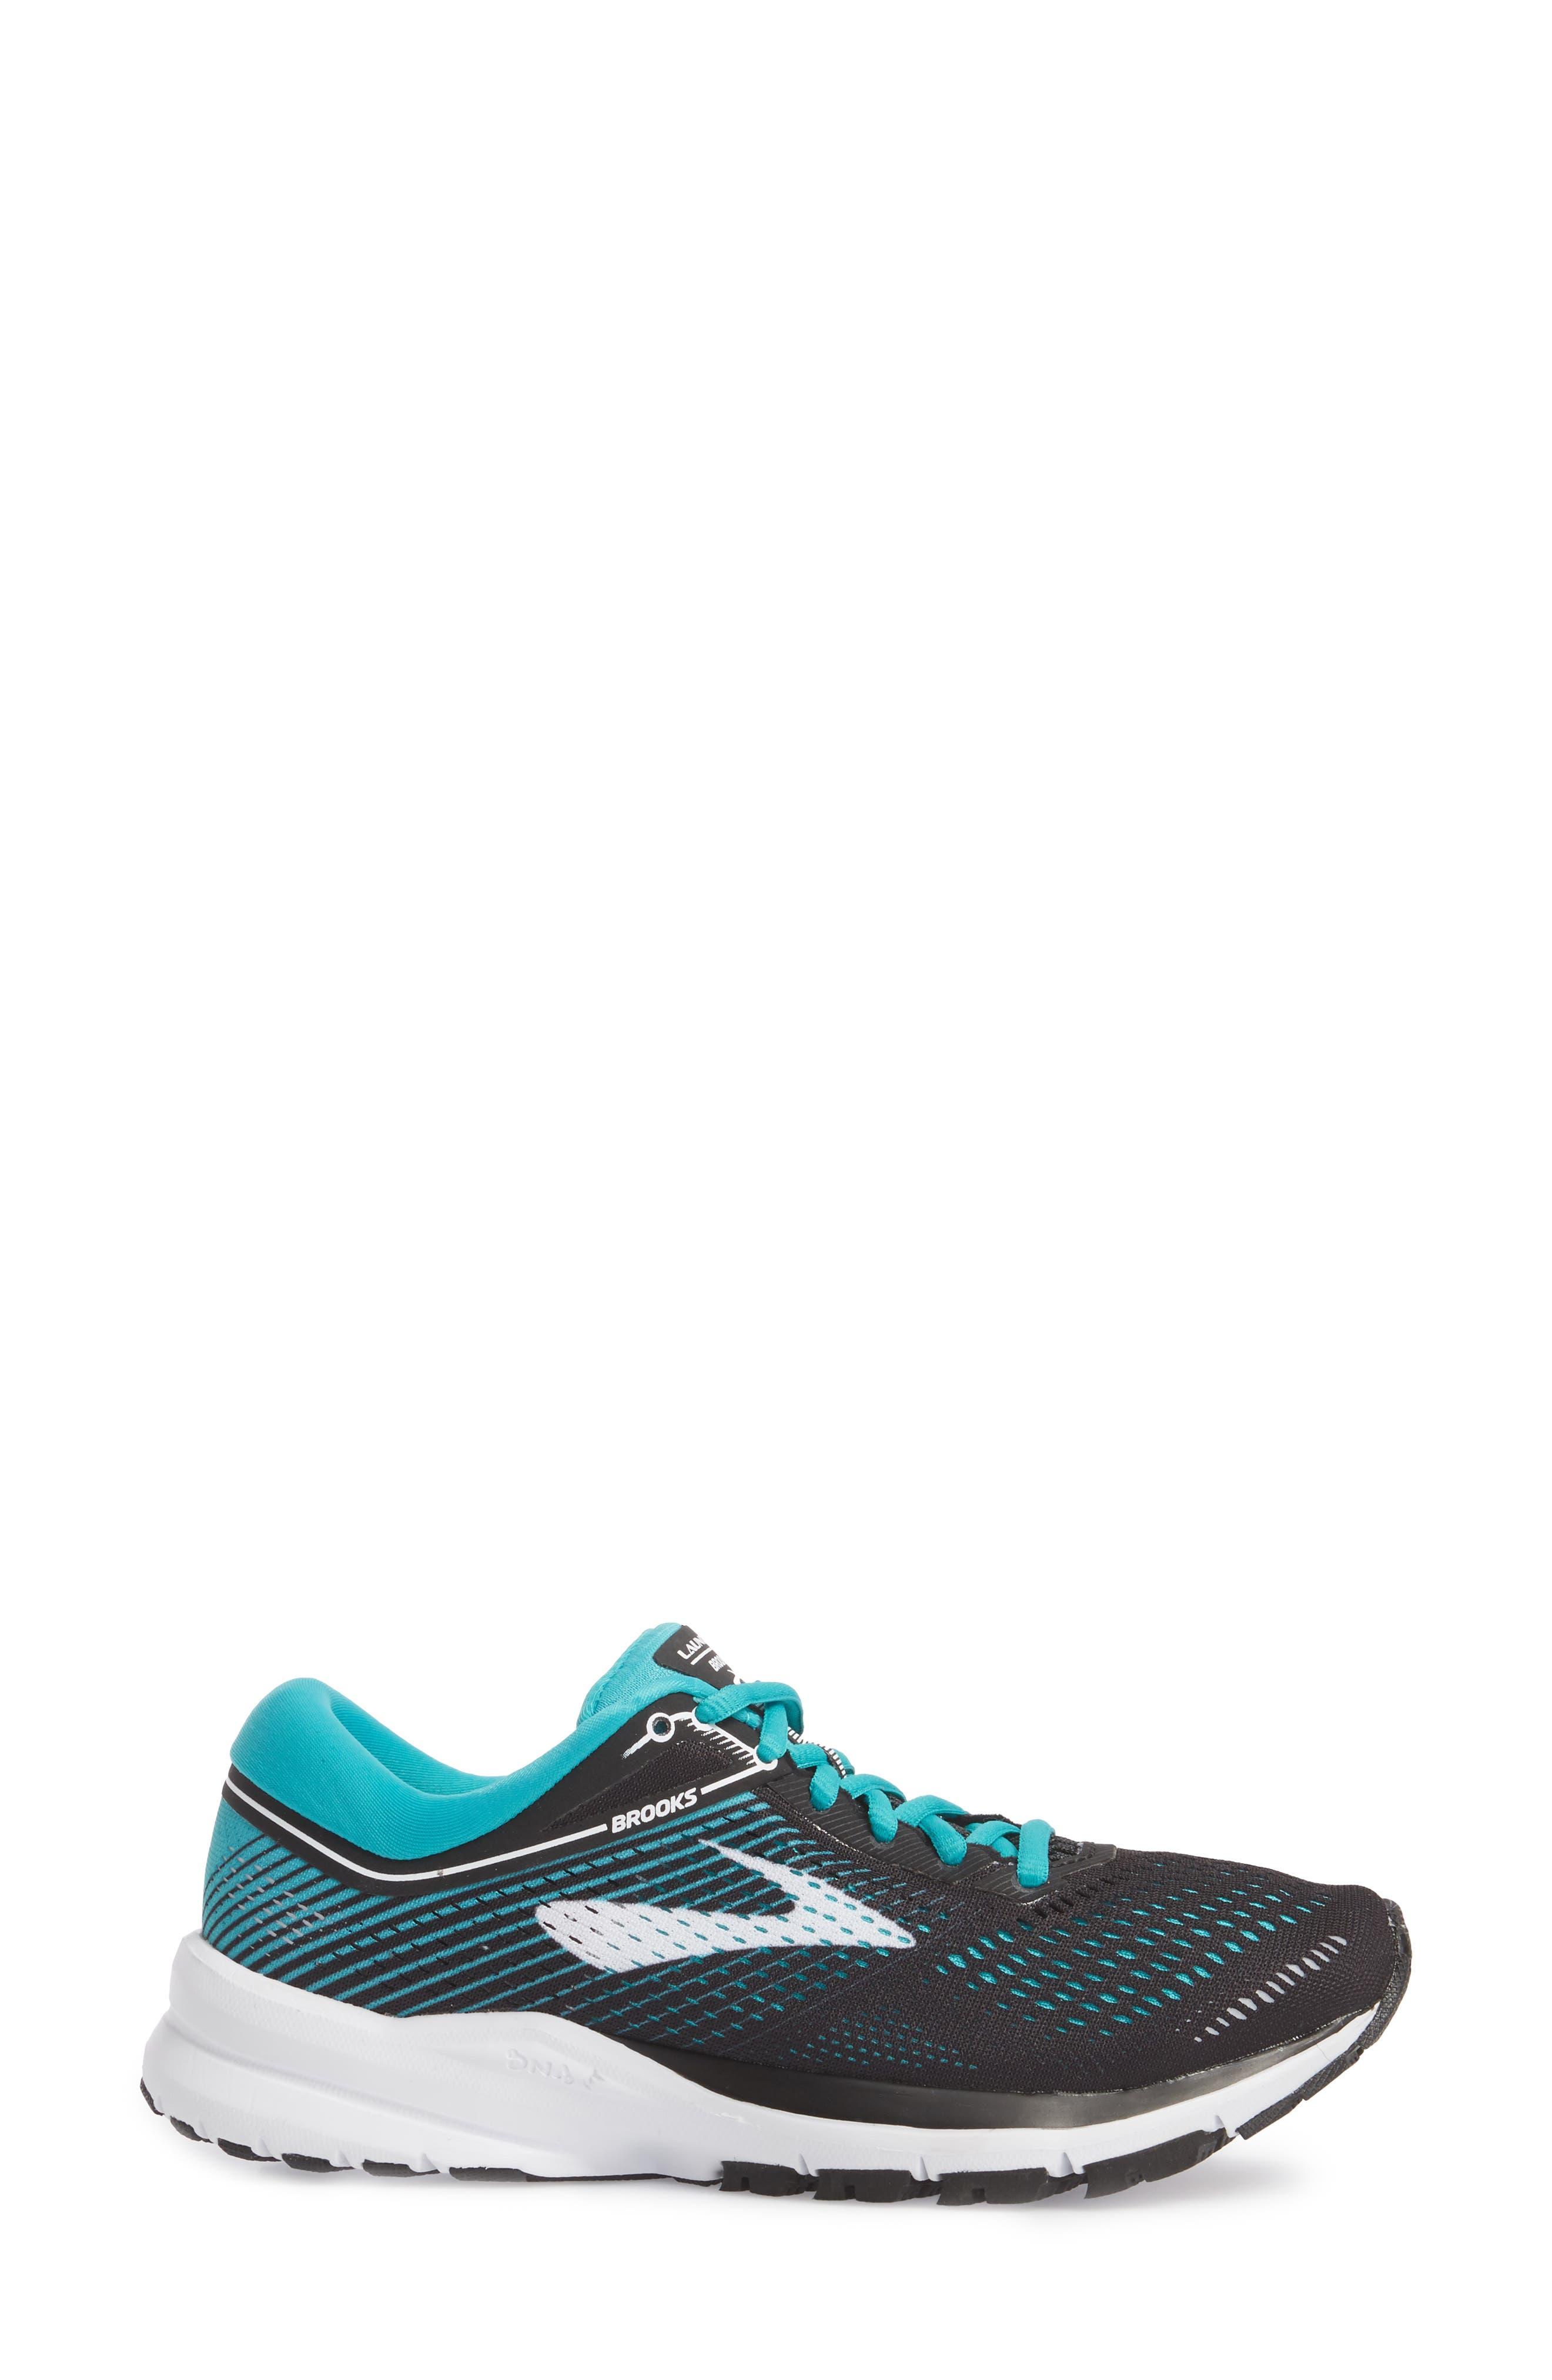 BROOKS,                             Launch 5 Running Shoe,                             Alternate thumbnail 3, color,                             BLACK/ TEAL GREEN/ WHITE